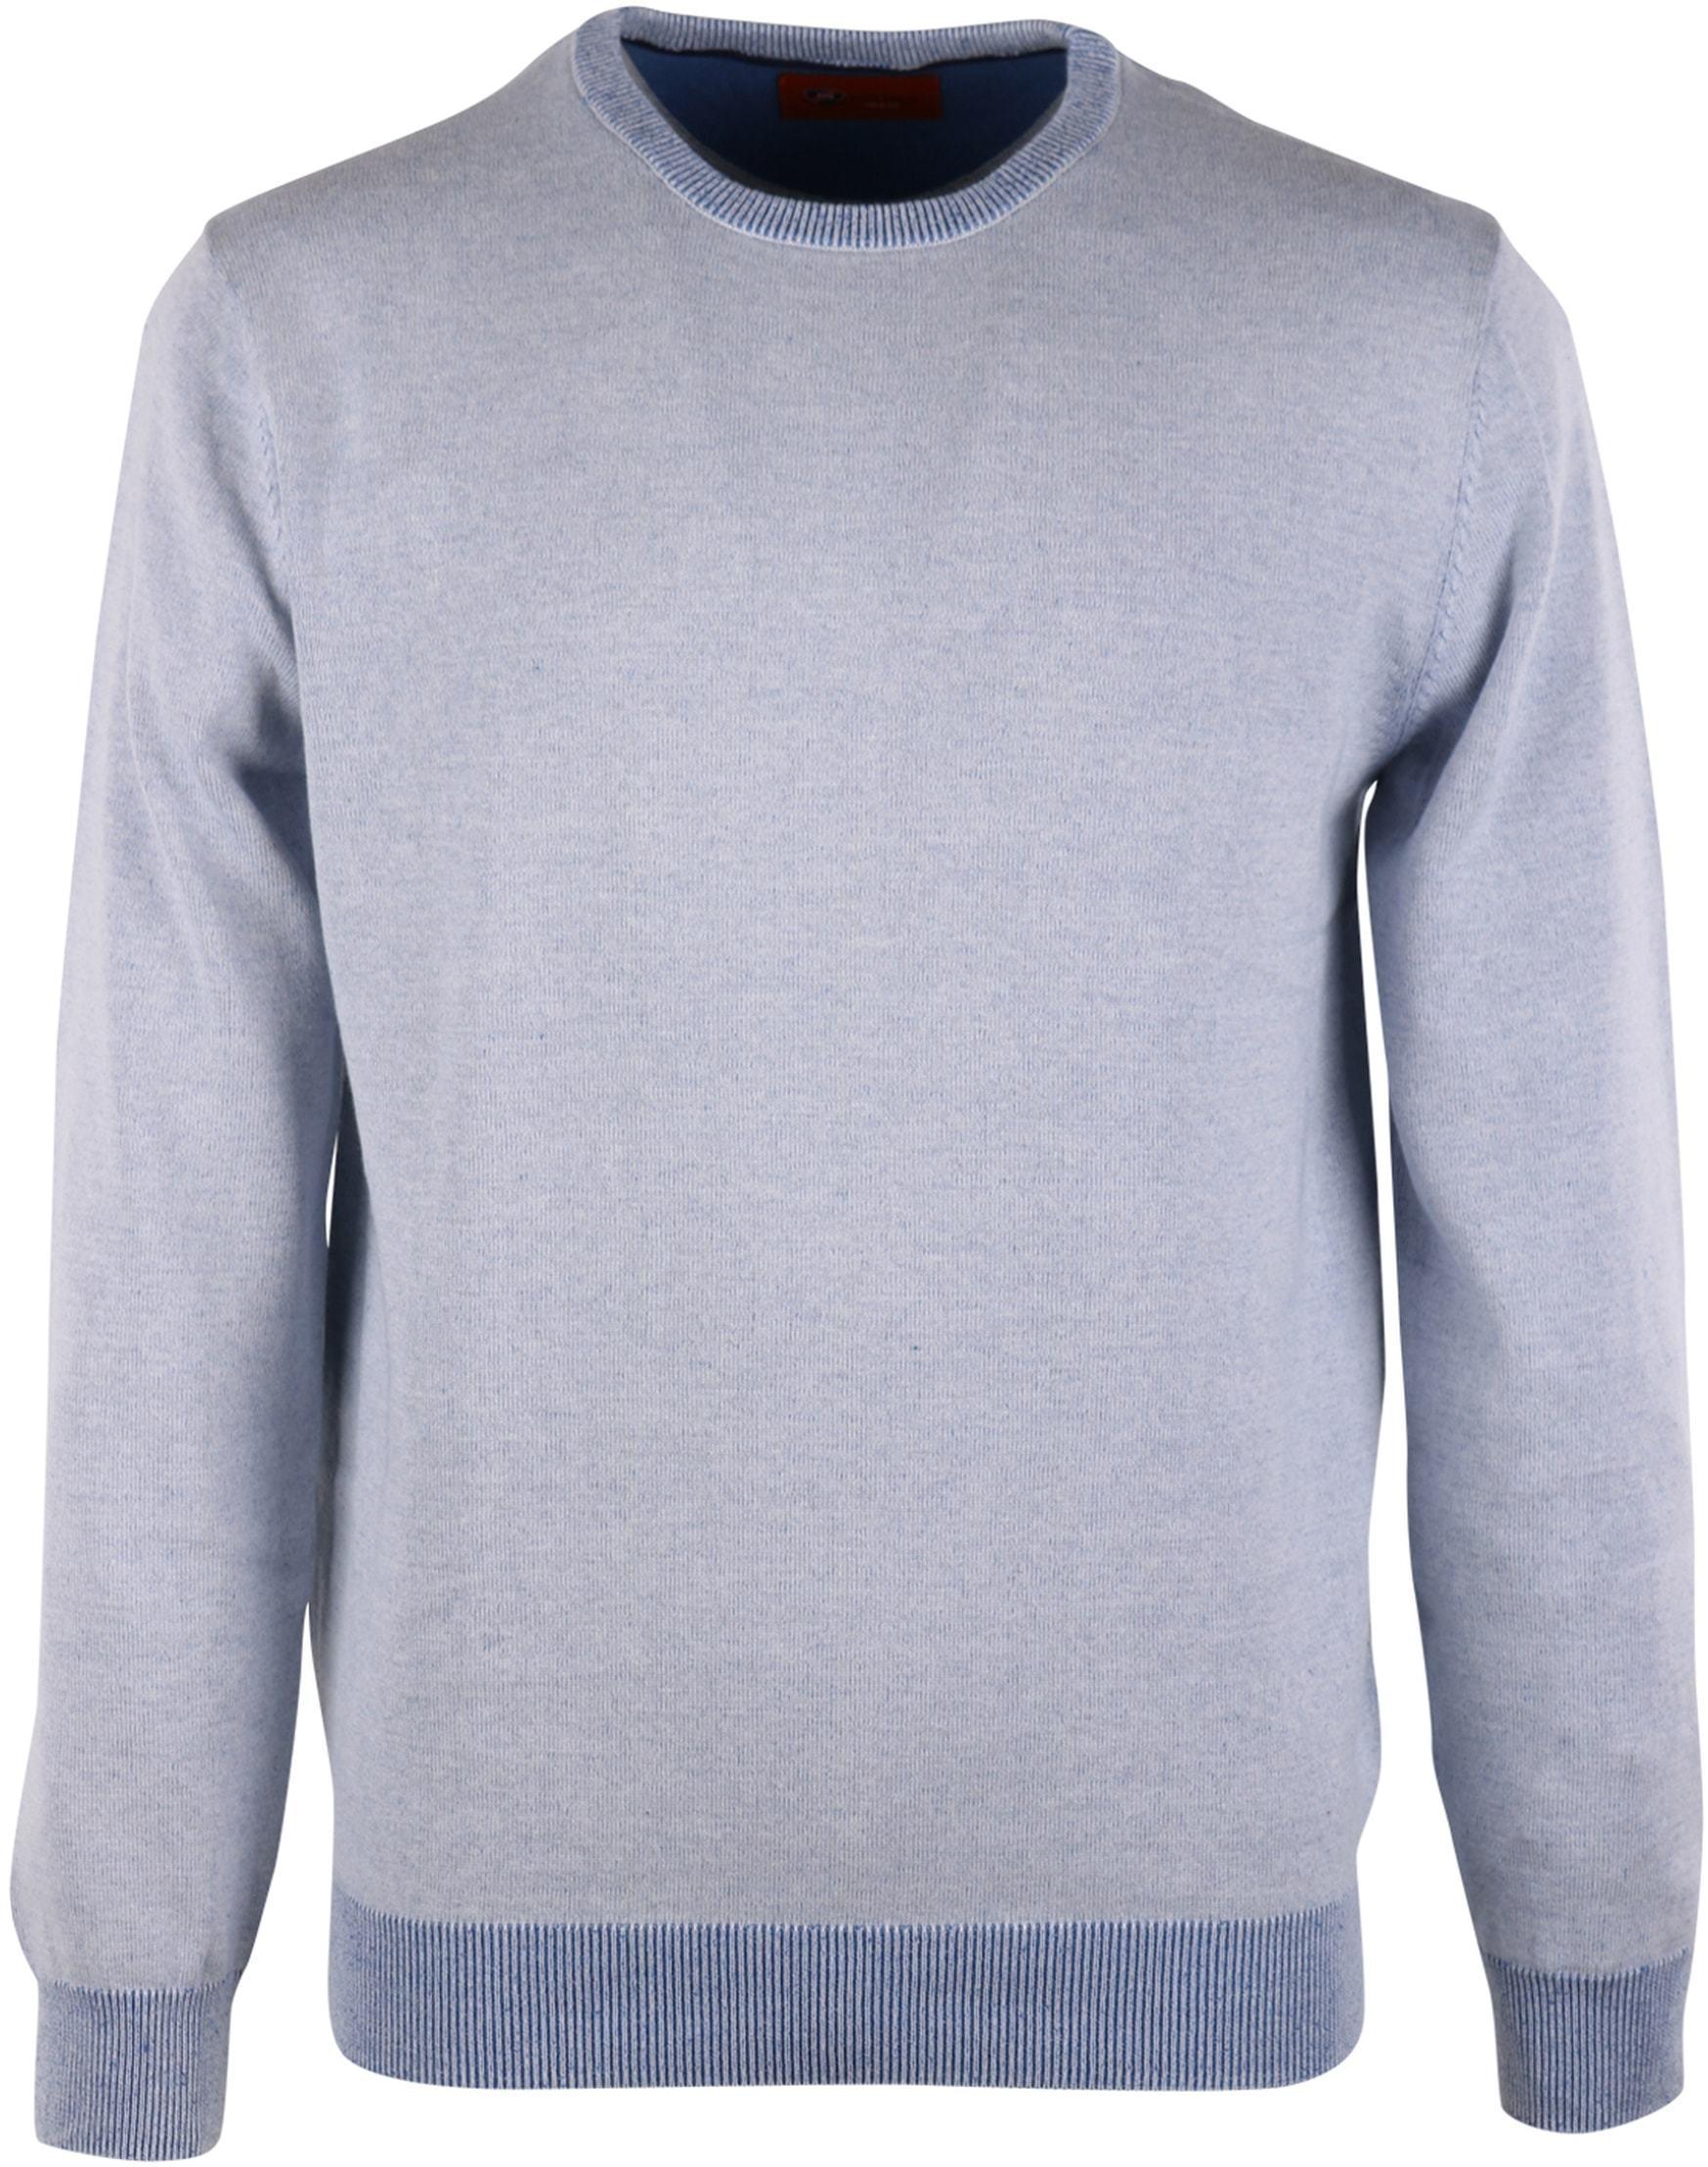 Pullover O-Hals Blauw foto 0